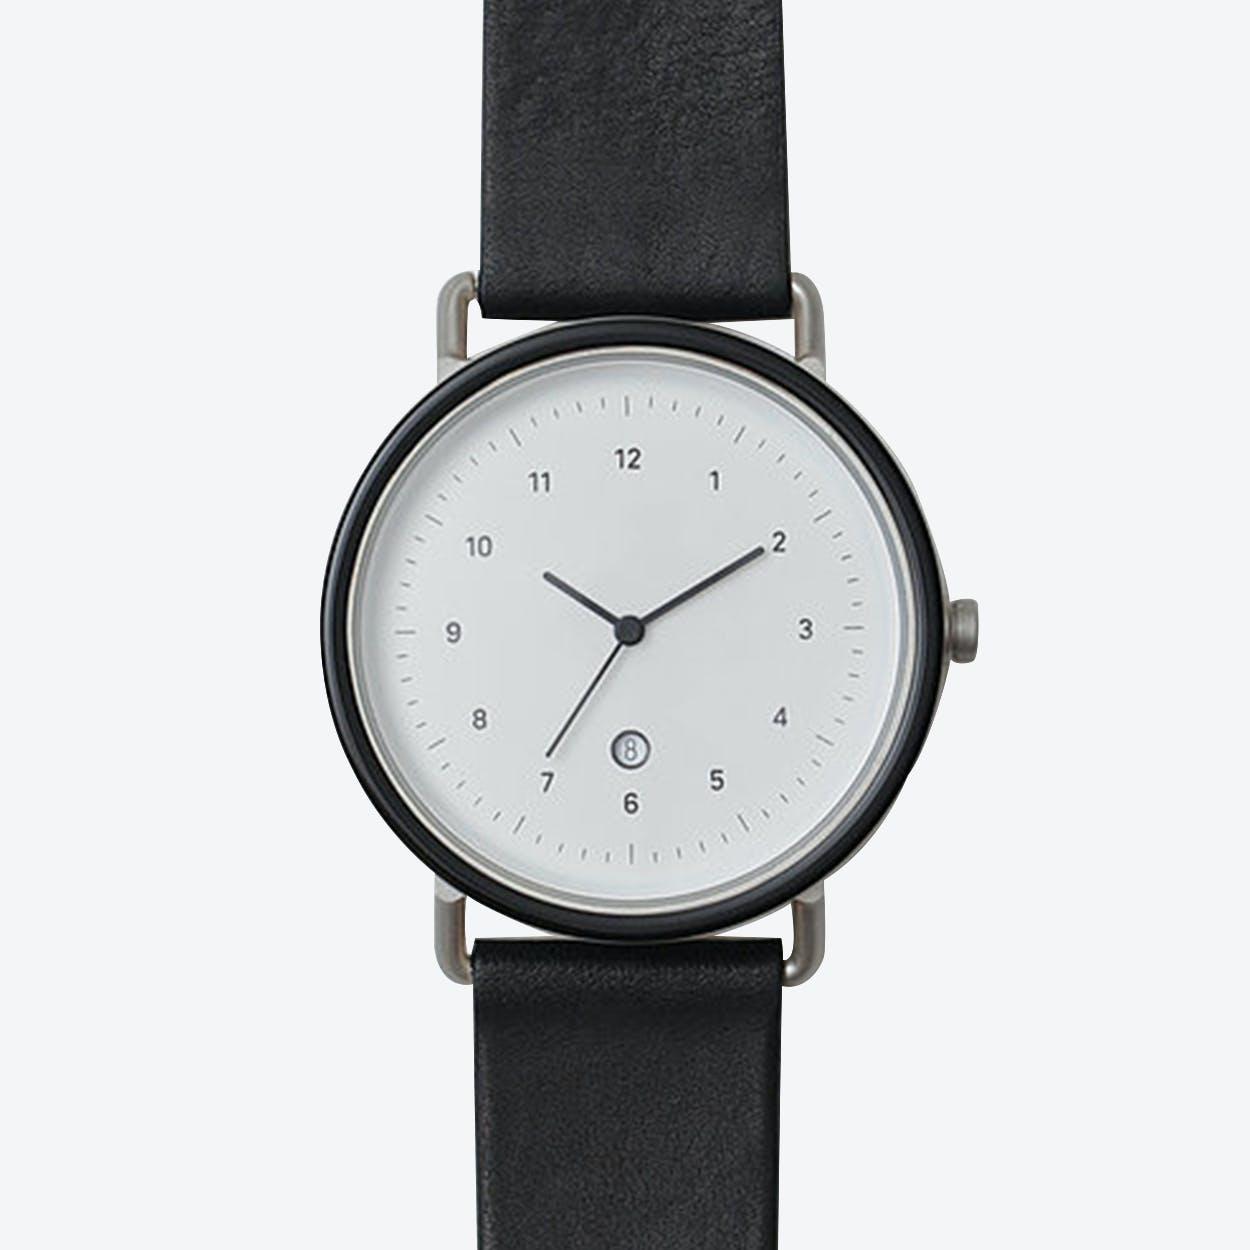 S105 Watch (J.BLK/ SIL CASE/ BLK STRAP)